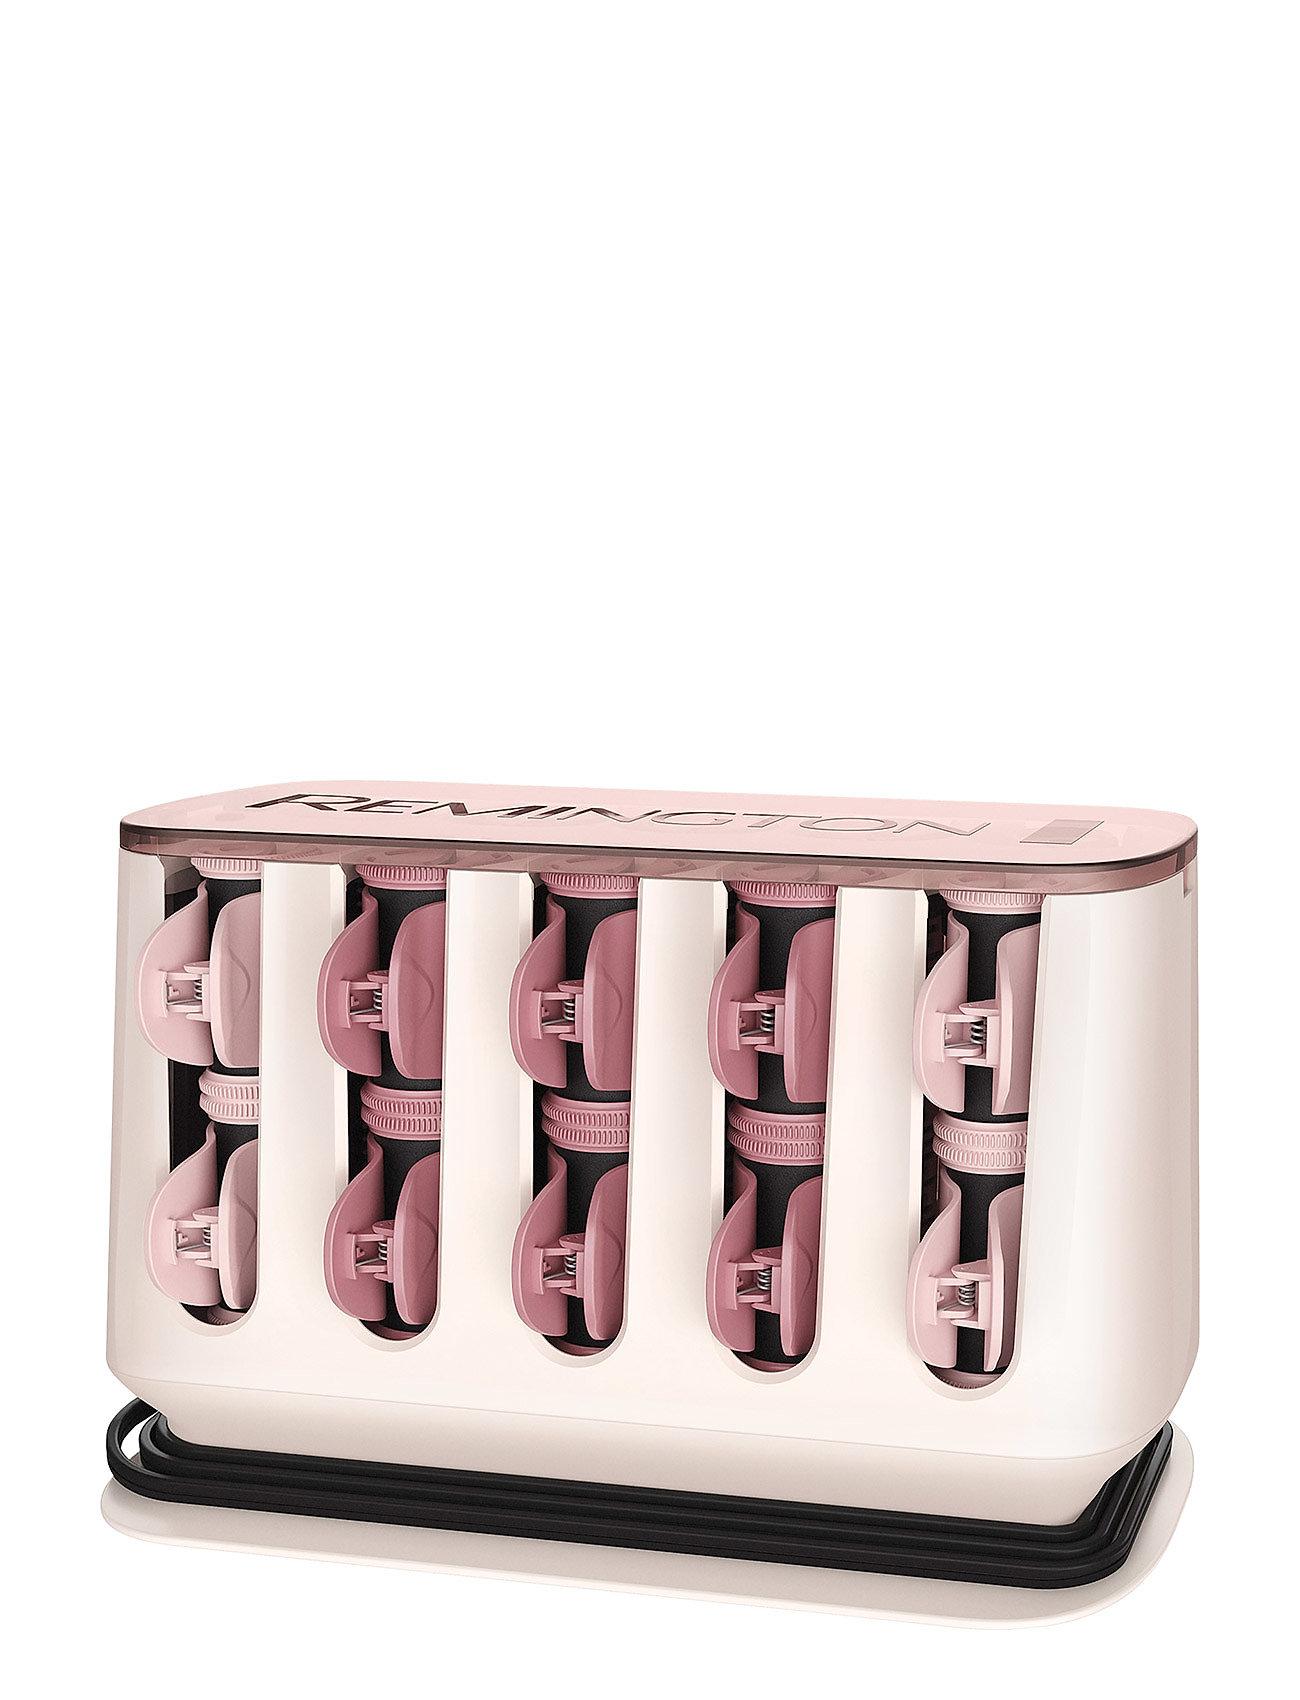 Pro-luxe Rollers (No Color) (69.95 €) - Remington - Hiukset  2c20a141fe